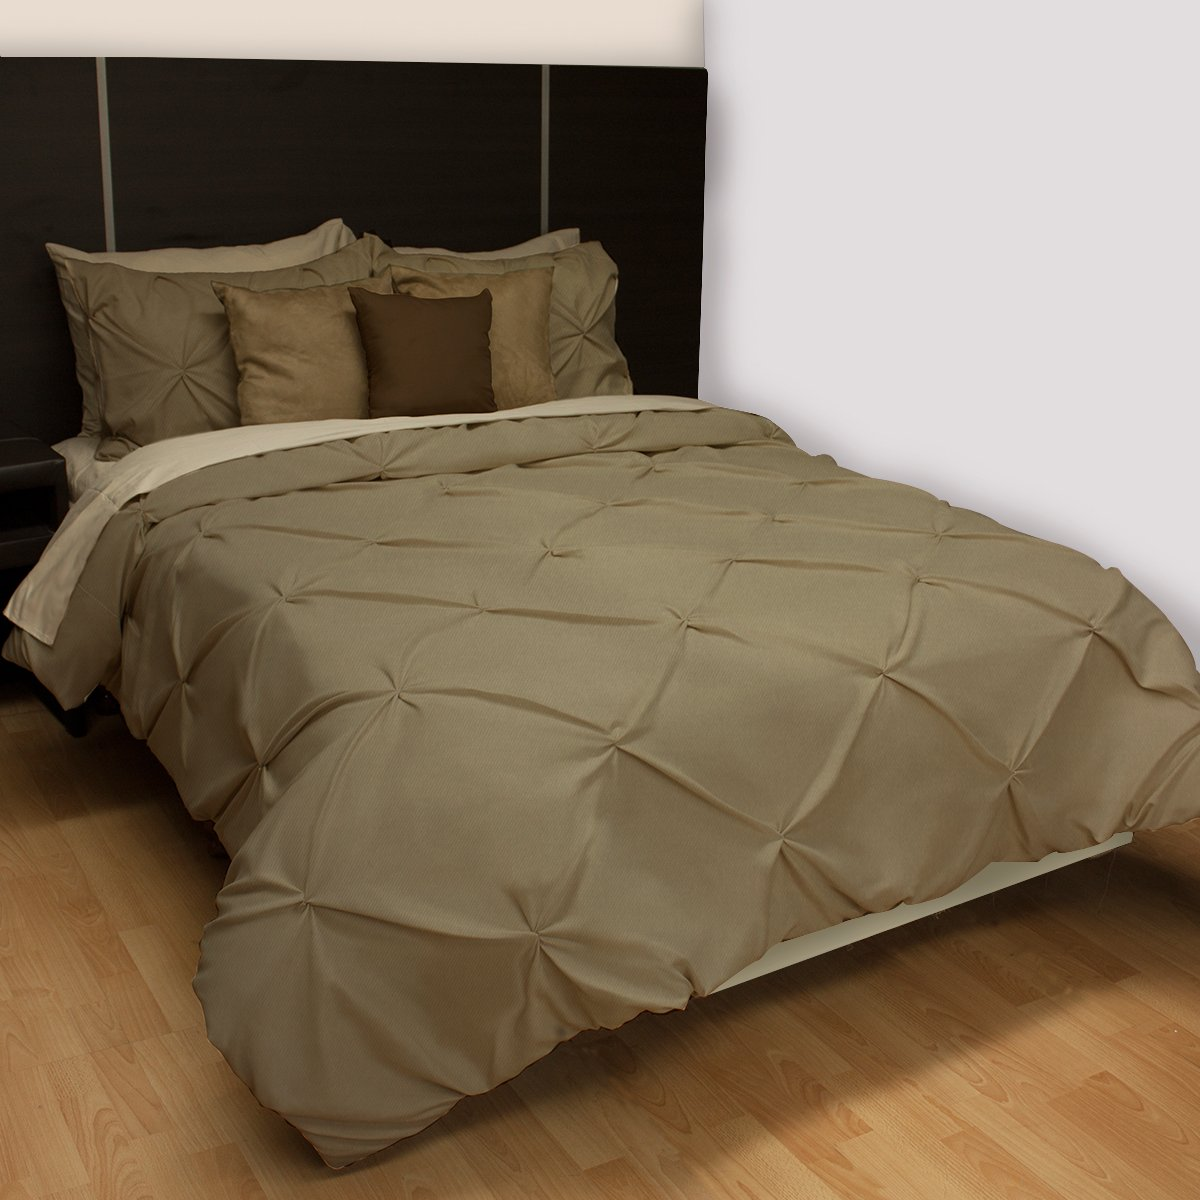 Paquete de cama king size portobello sears com mx me for Sabanas para cama king size precios